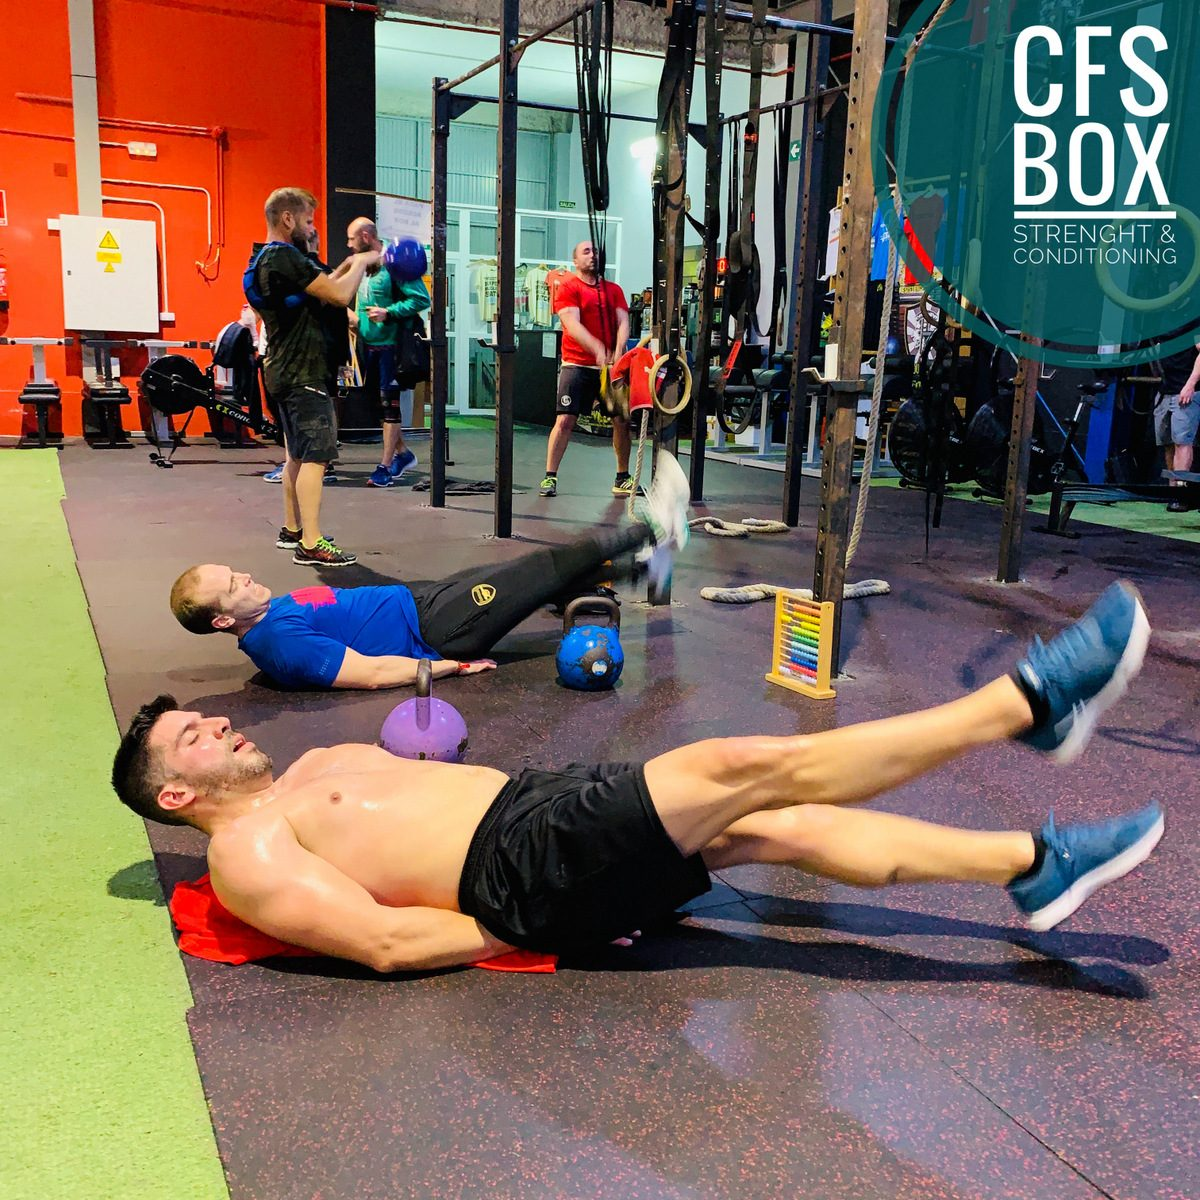 Box CFS Box CrossFit Sevilla training lions